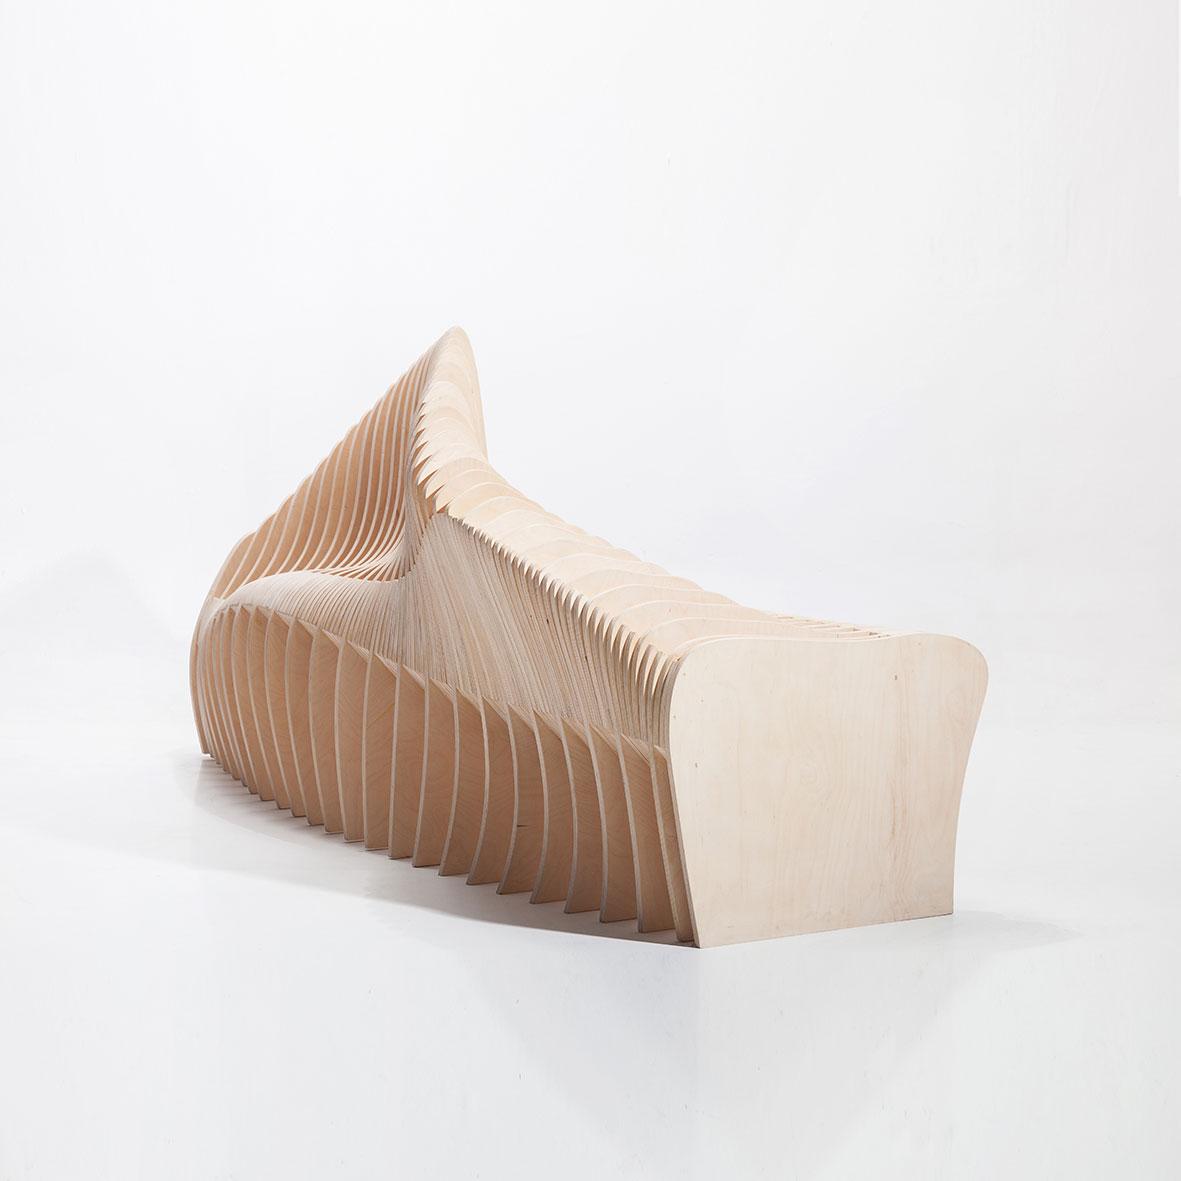 Benchsaurus by Alain Bernard y Javier Zaratiegui - Creative Work - $i